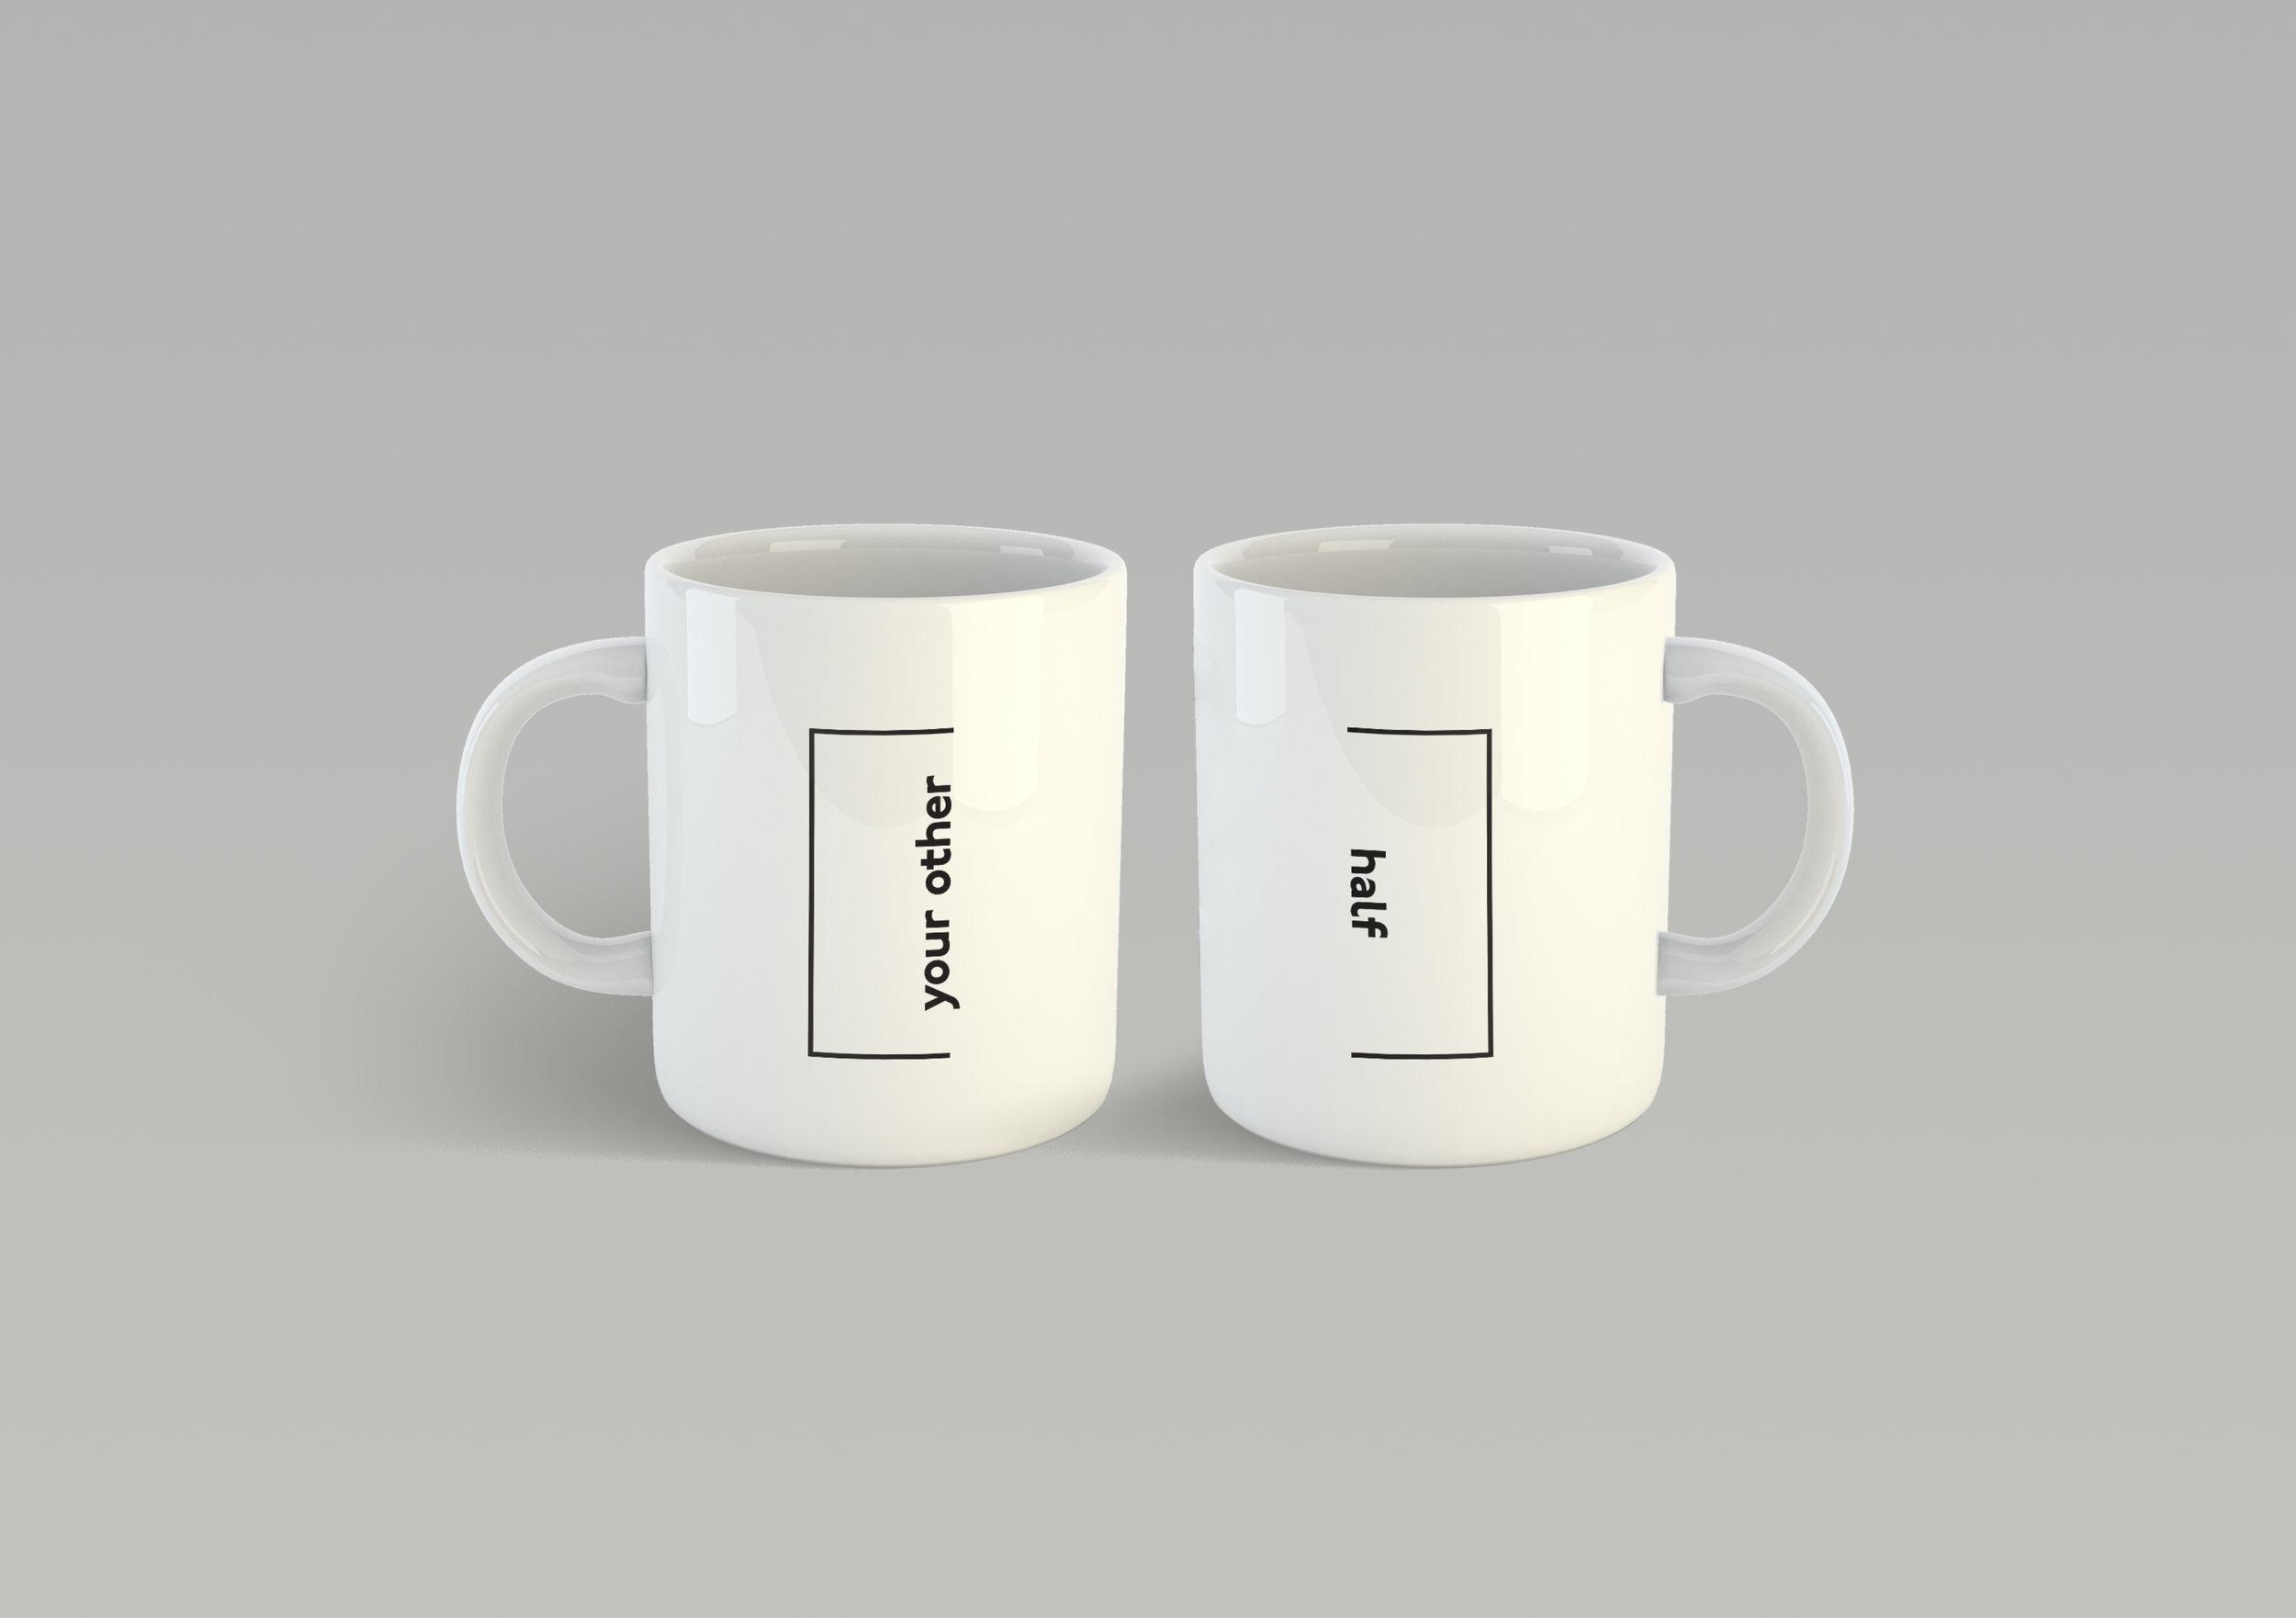 In Good Company mugs